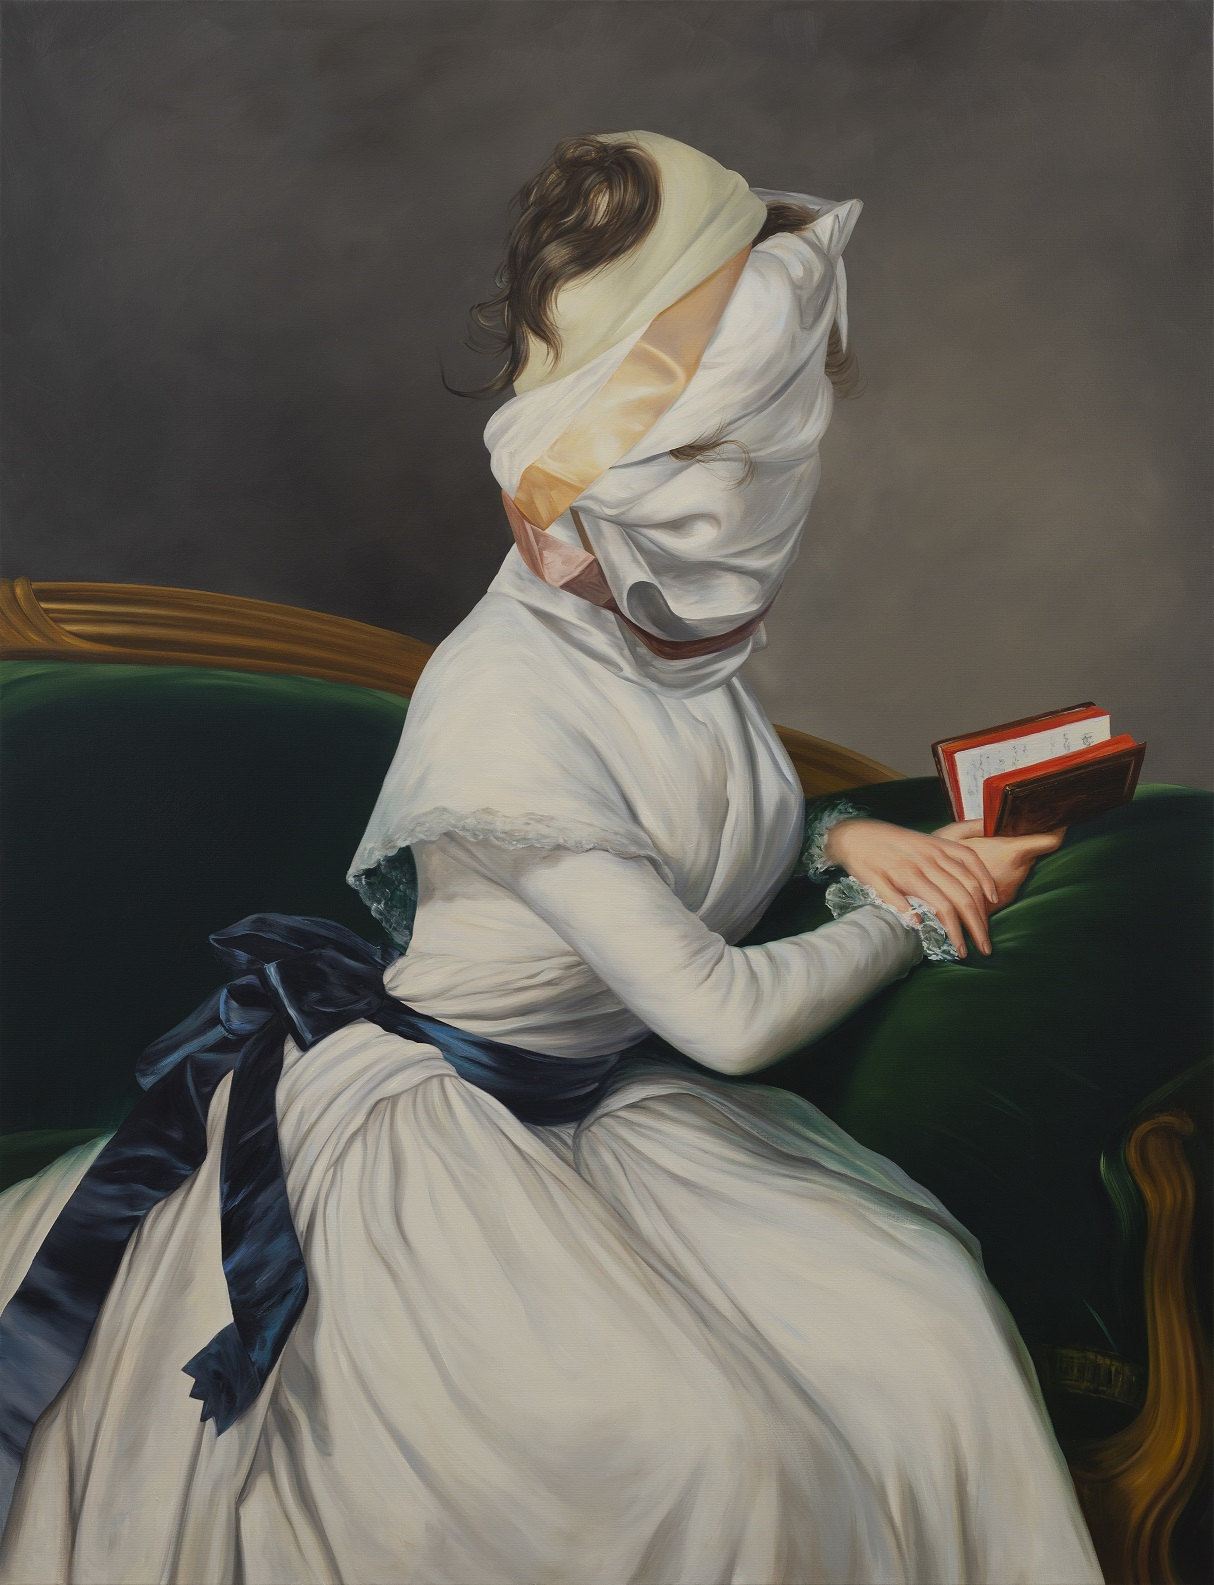 © Ewa Juszkiewicz Untitled (after Élisabeth Vigée Le Brun), 2019 olej na płótnie / oil on canvas 150,00 x 115,00 cm. Courtesy of lokal_30